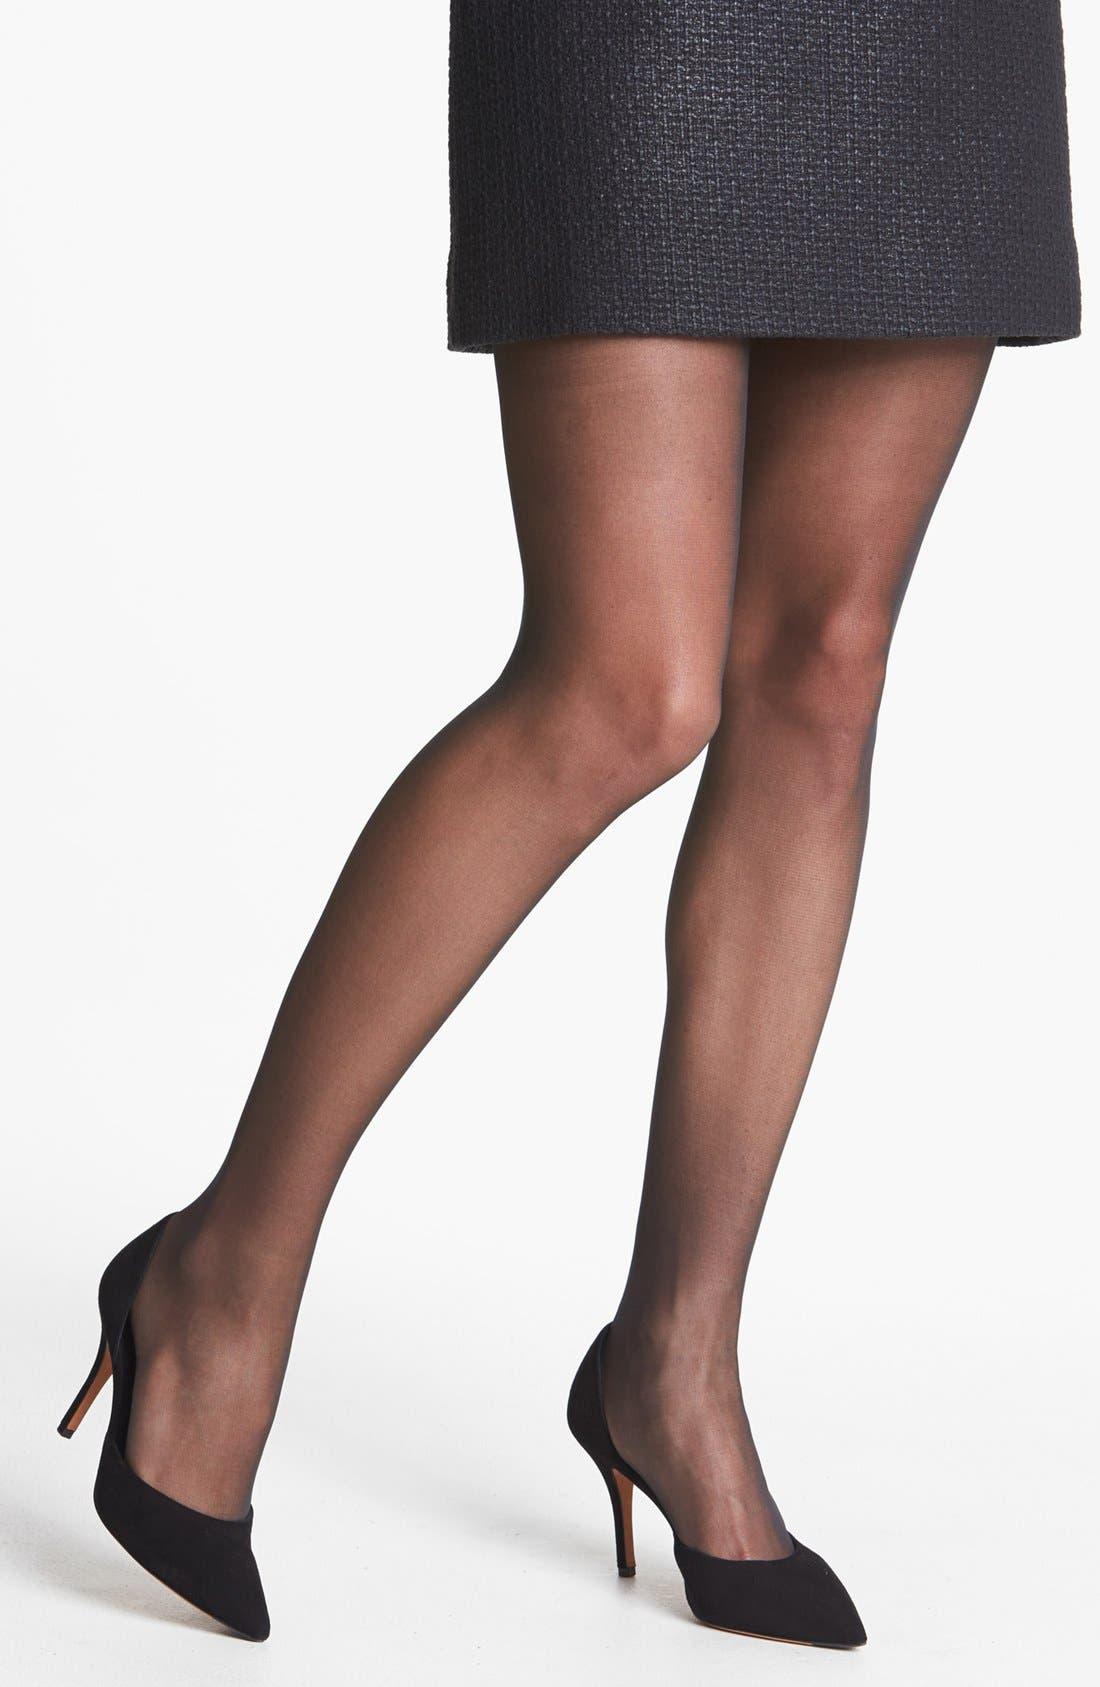 Main Image - DKNY Lowrise Girlshort Control Top Pantyhose